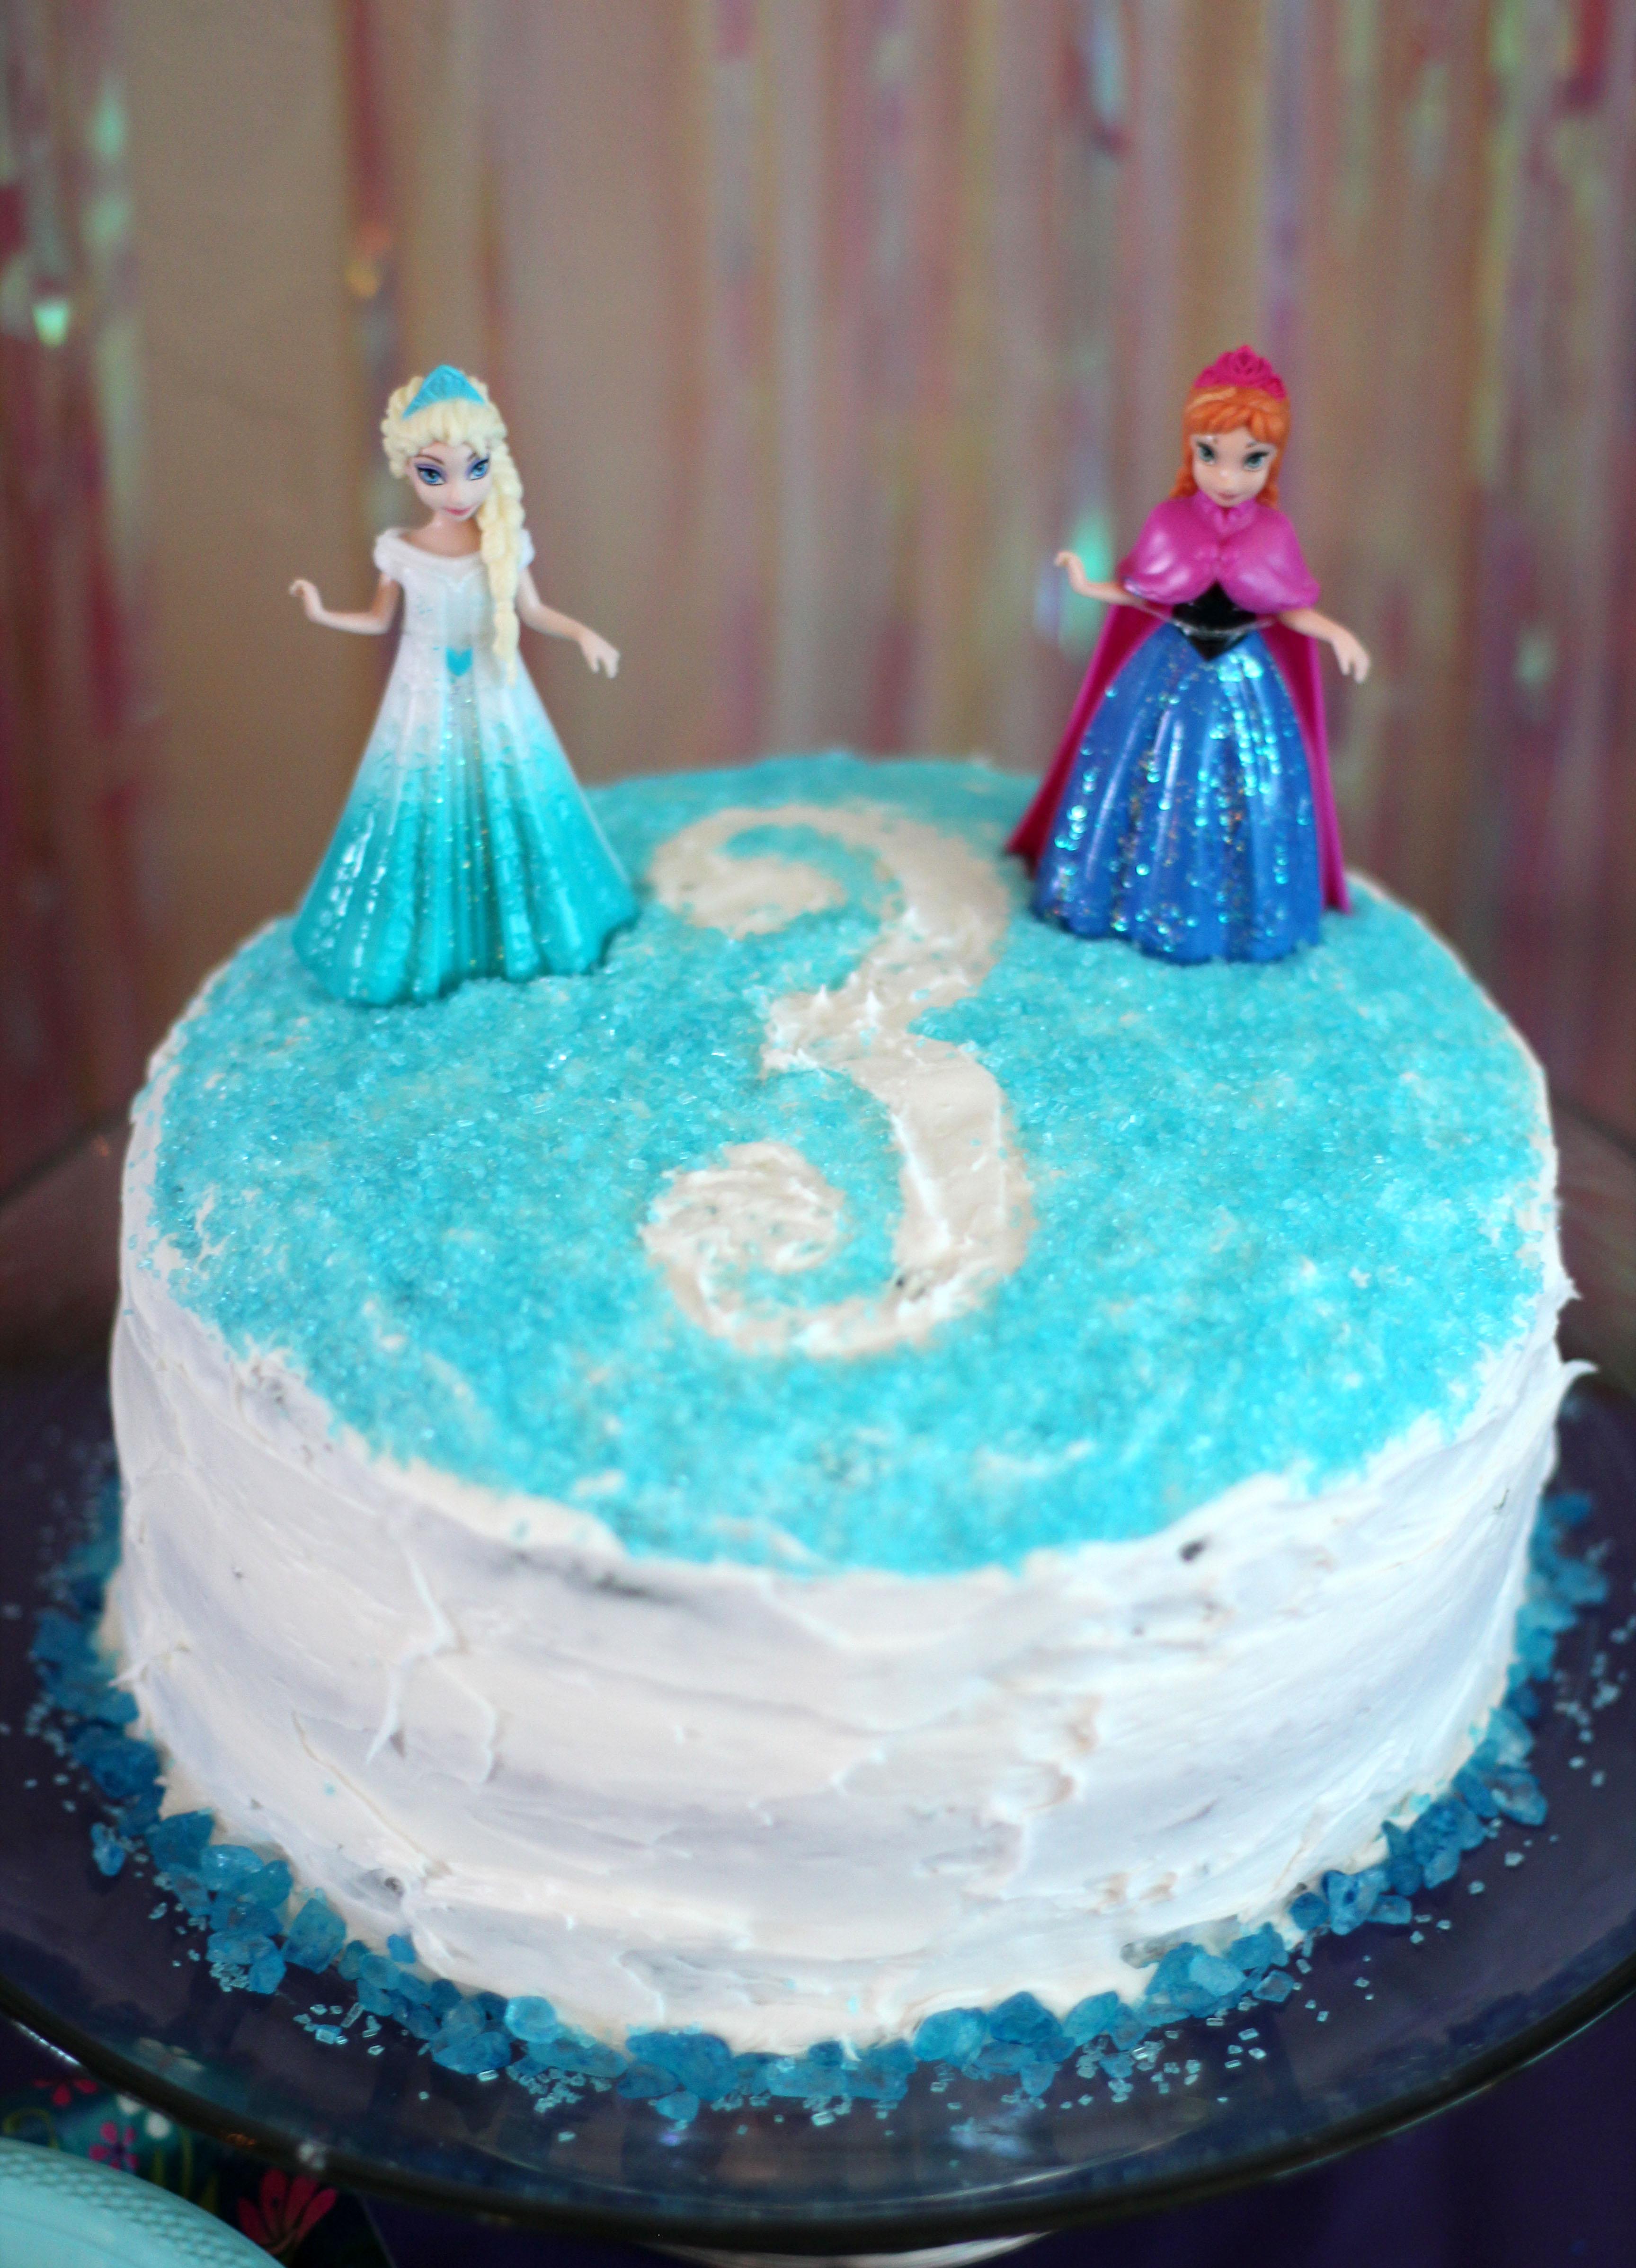 Haddisons Frozen Inspired 3rd Birthday